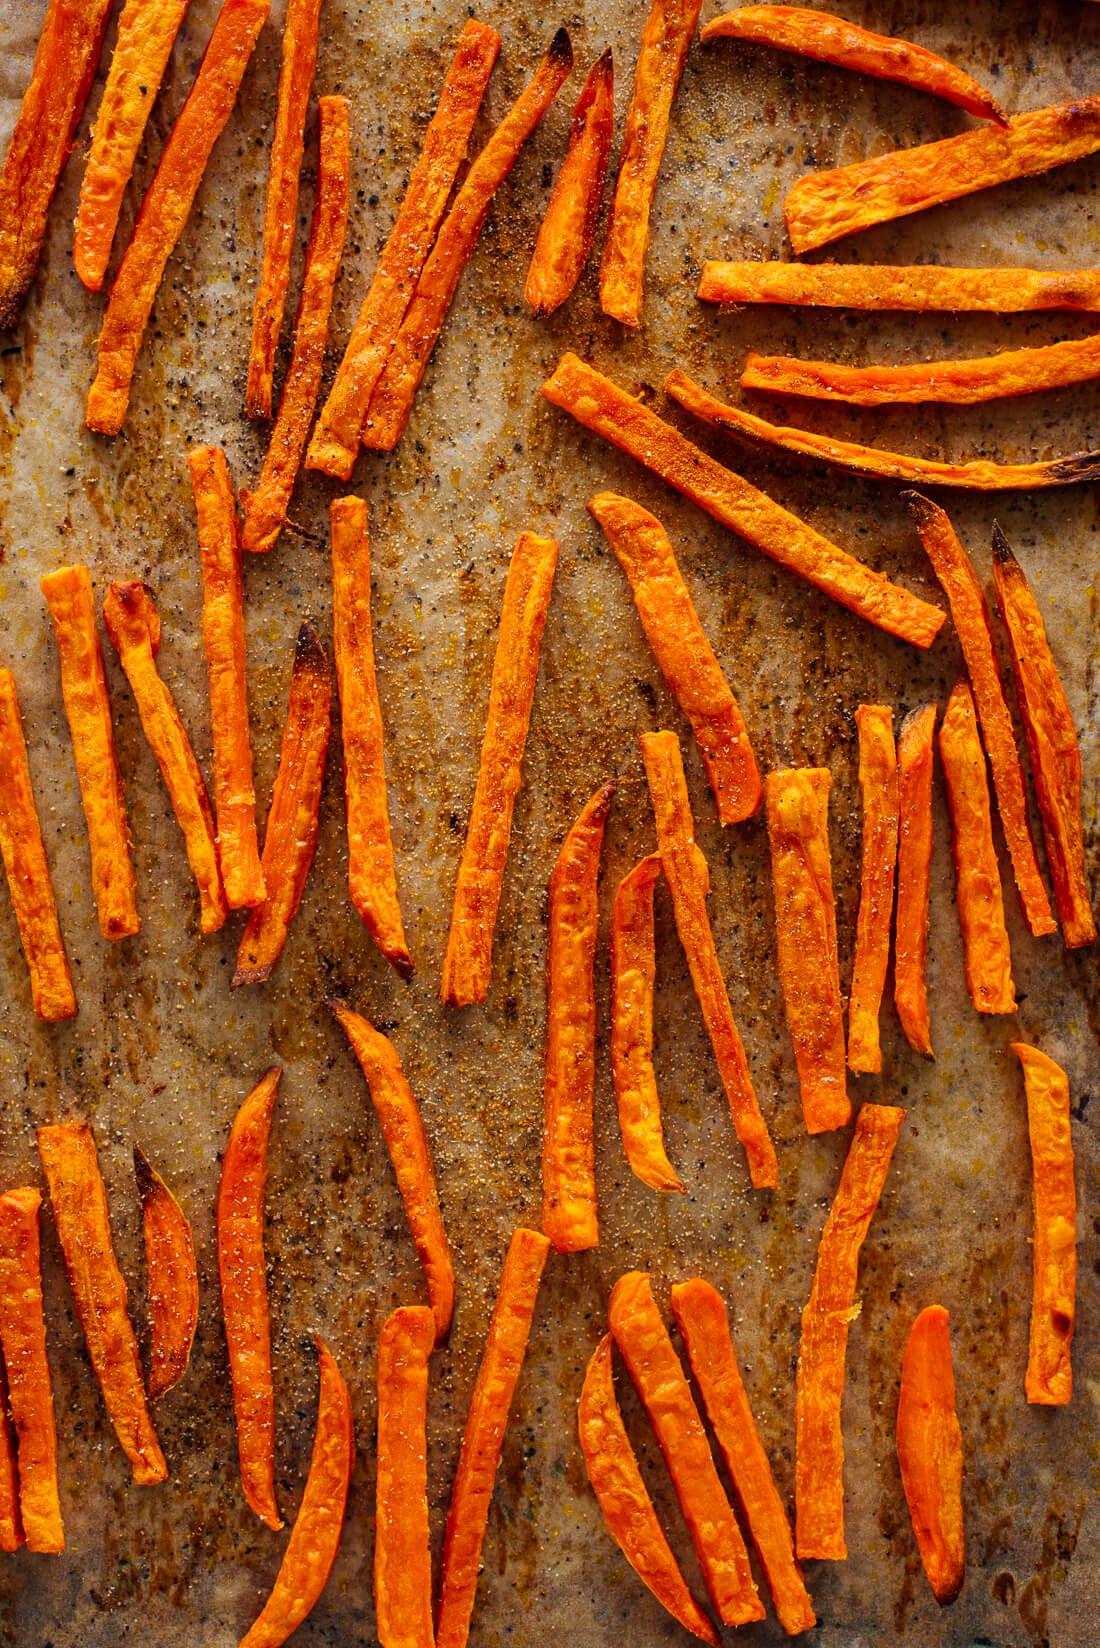 seasoned crispy baked sweet potato fries